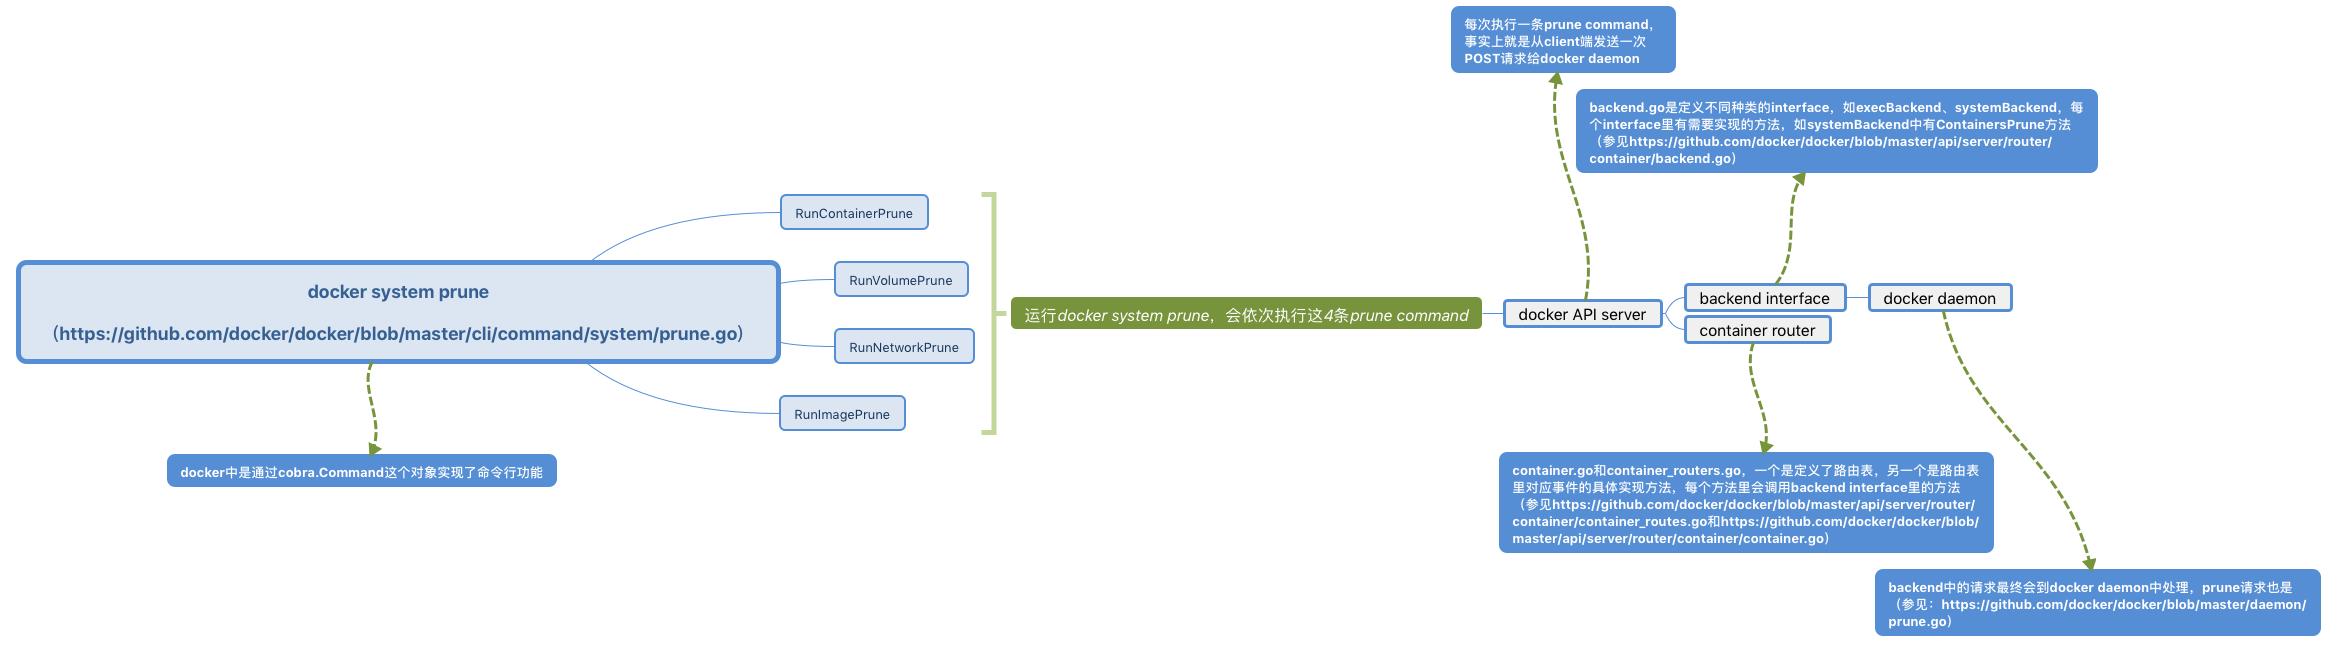 docker 1.13中docker system prune的浅析